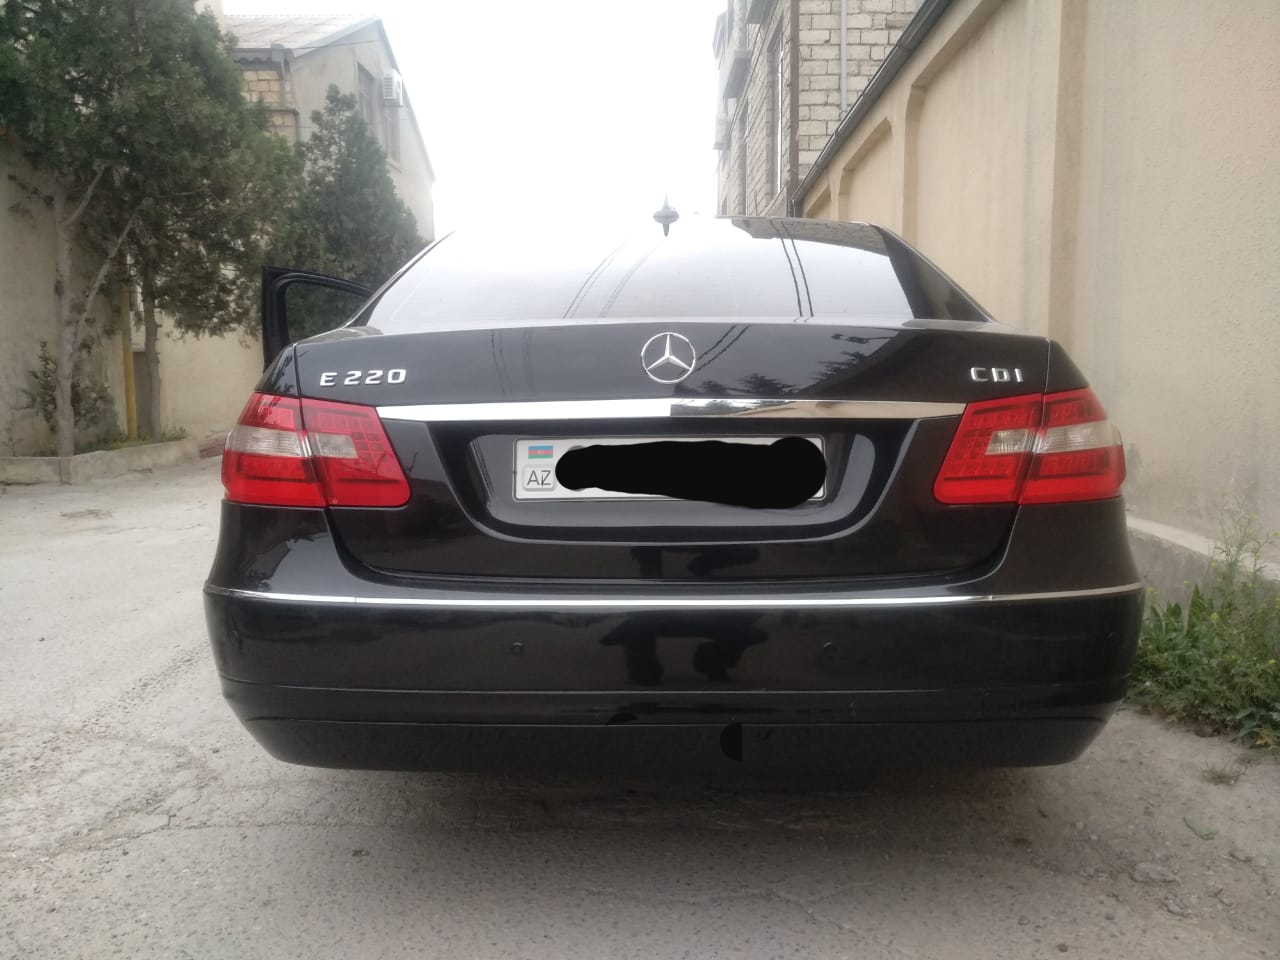 Mercedes-Benz E 220 2.2(lt) 2011 İkinci əl  $17800